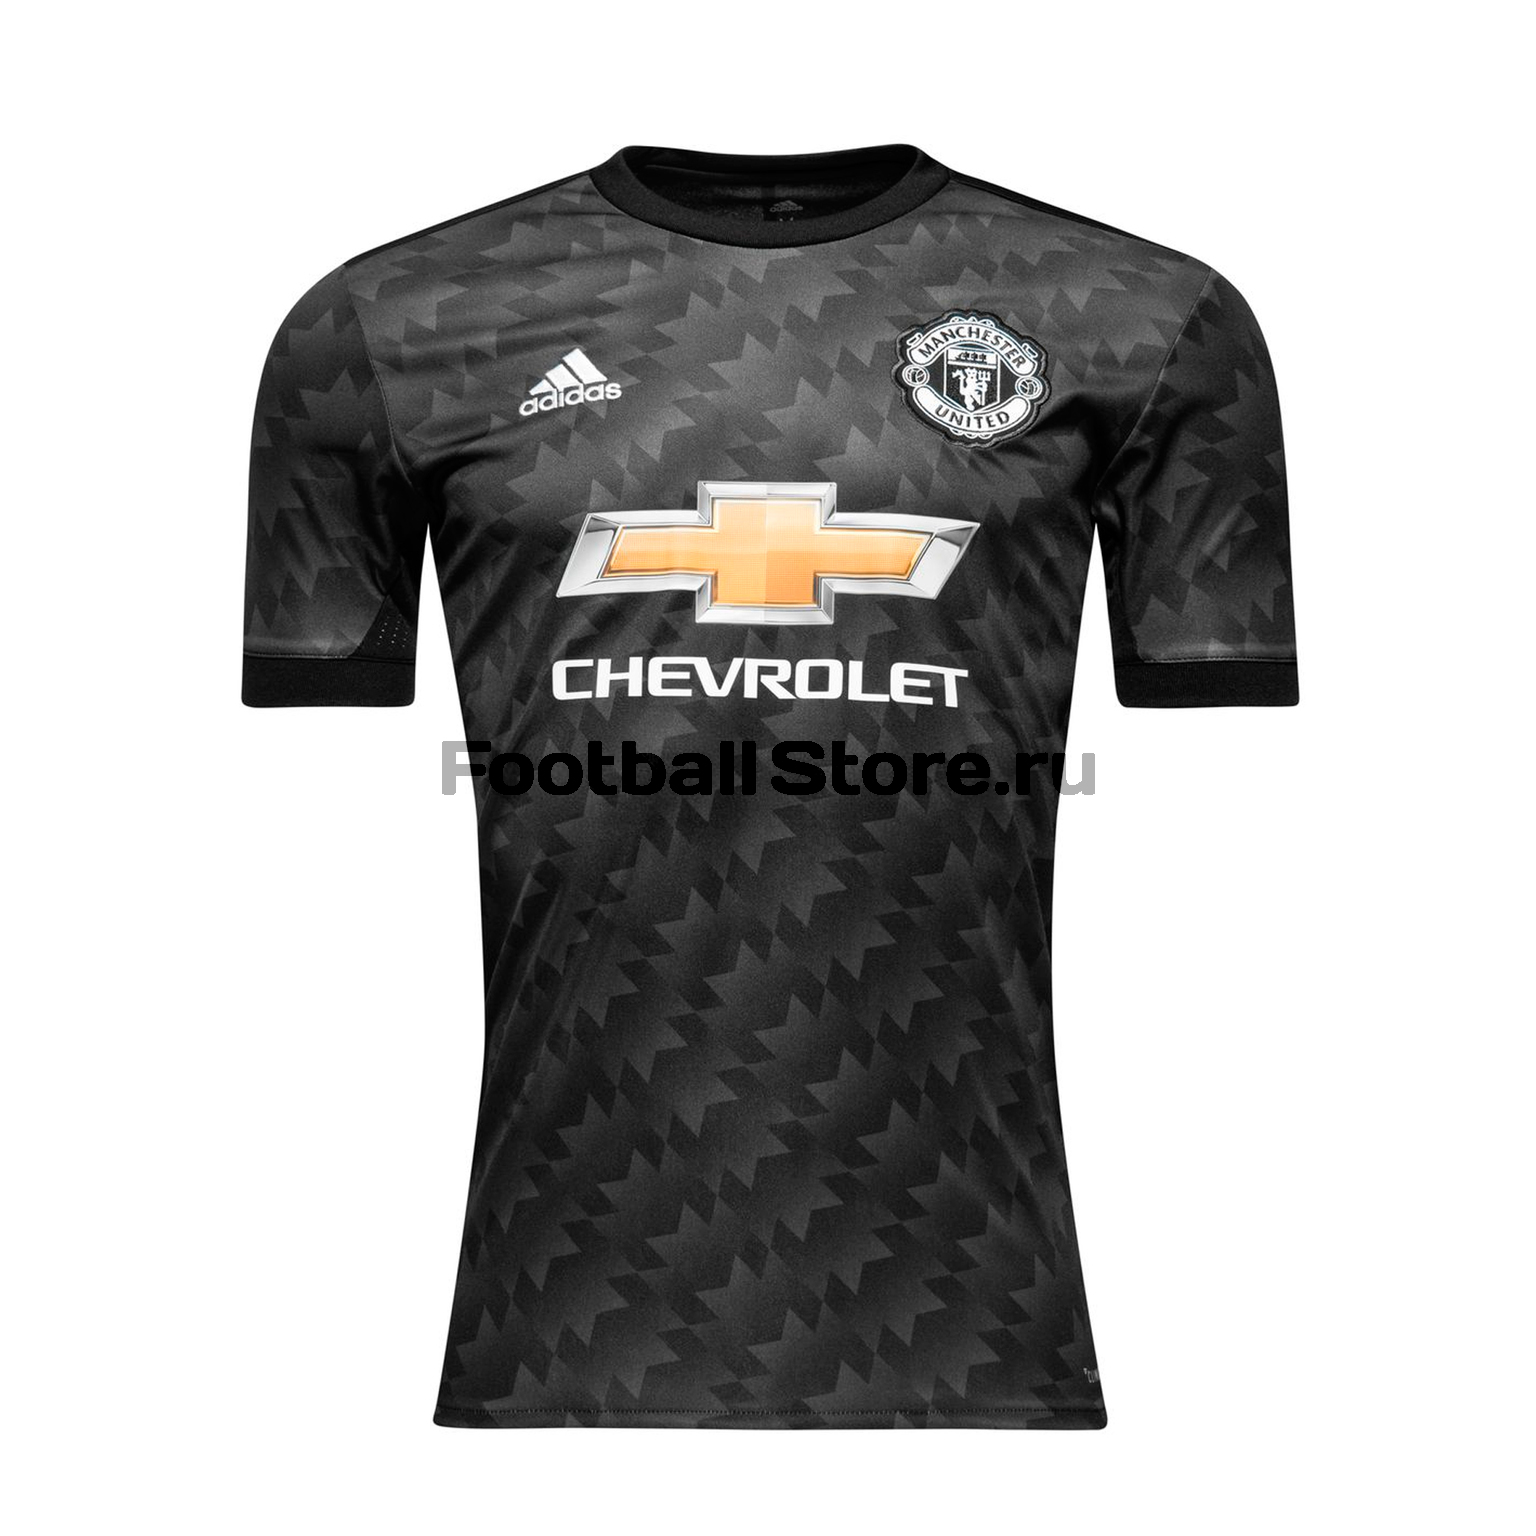 Manchester United Adidas Футболка игровая Adidas Manchester United Away BS1217 adidas футболка russia away